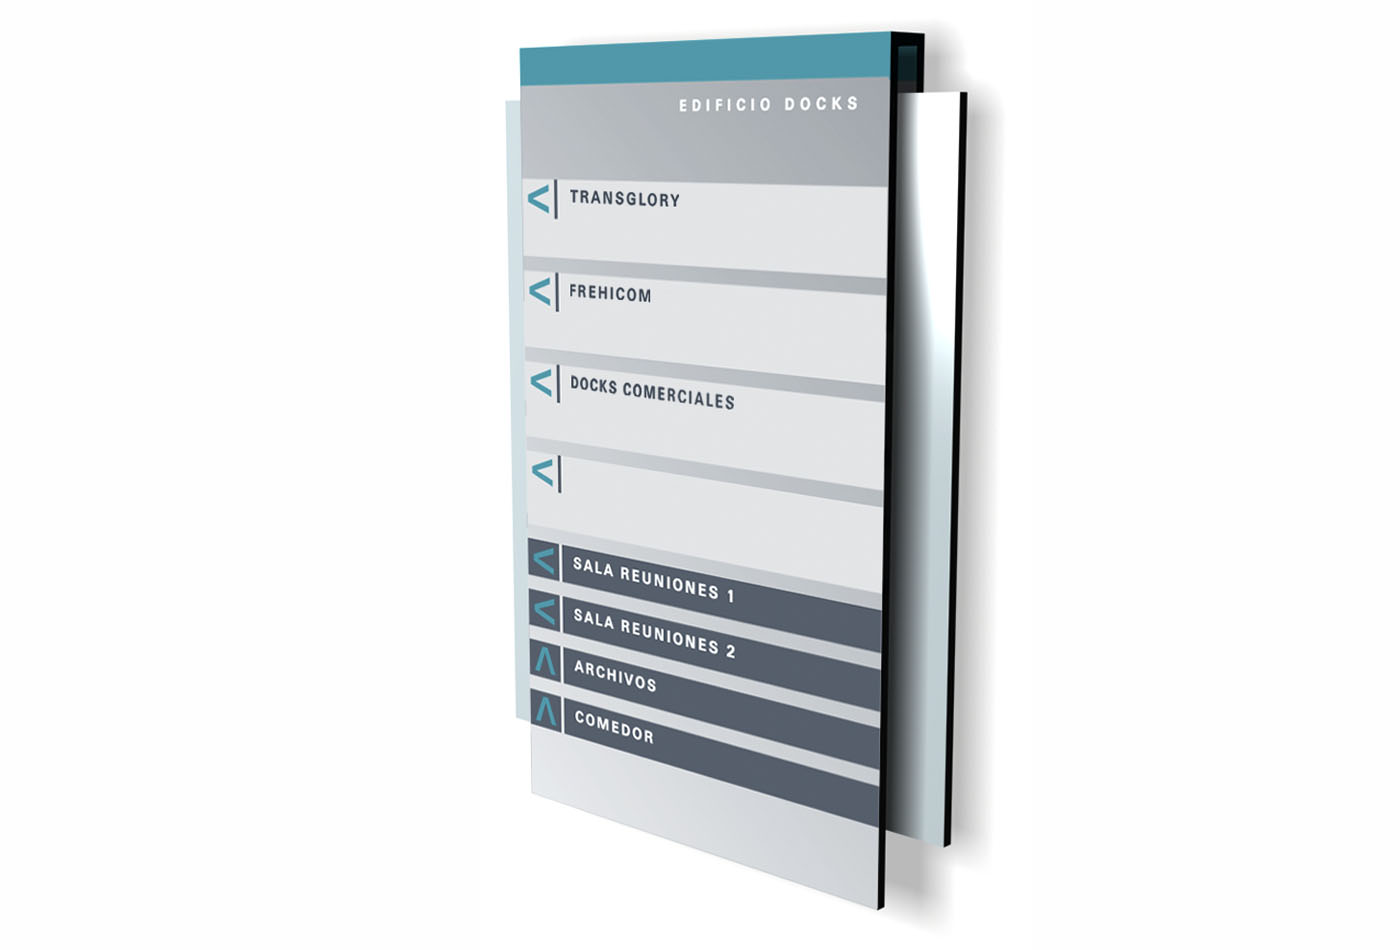 01-docks-creartiva-disseny-grafic-senyaletica-indicacion-situacion-